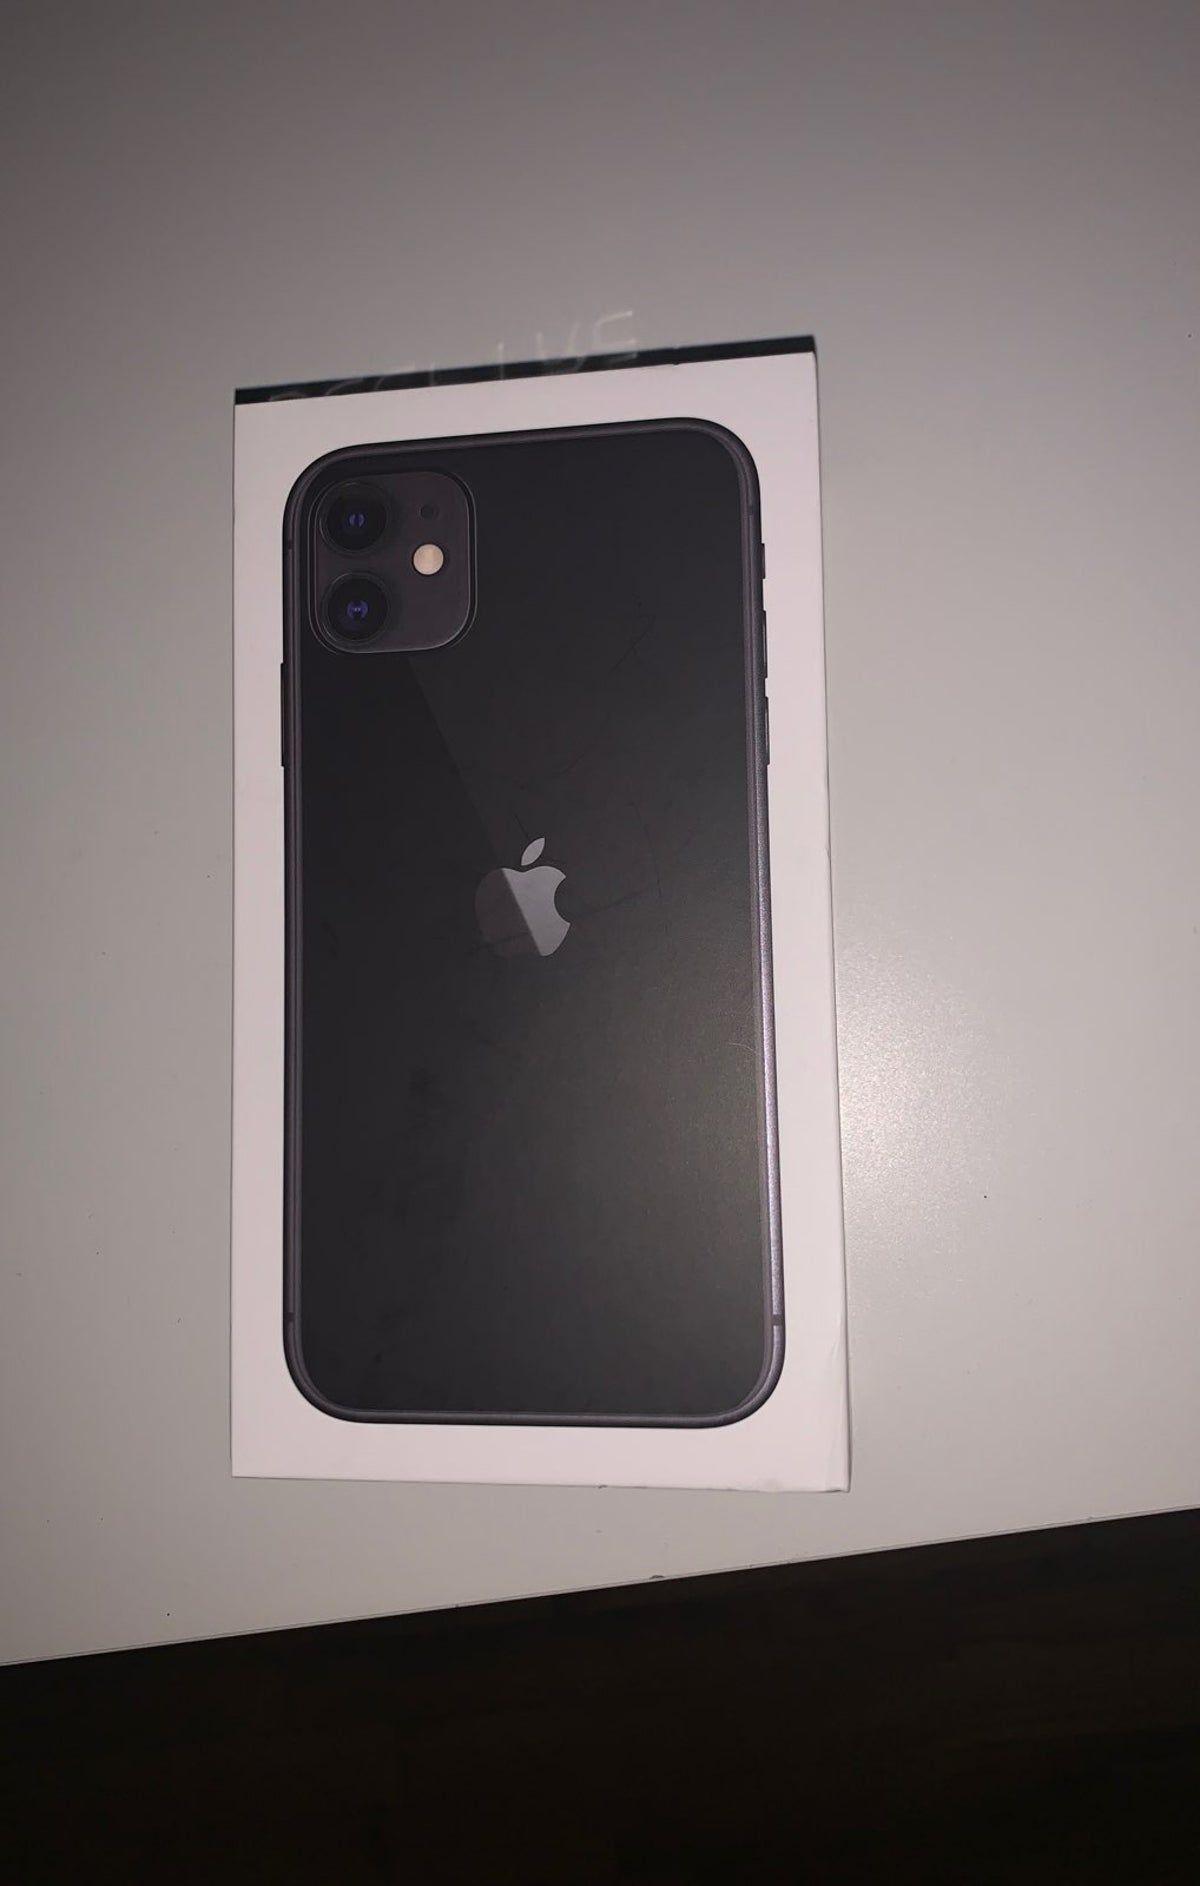 Iphone 11 Black 64 Gb Box In 2021 Iphone 11 Iphone Apple Smartphone